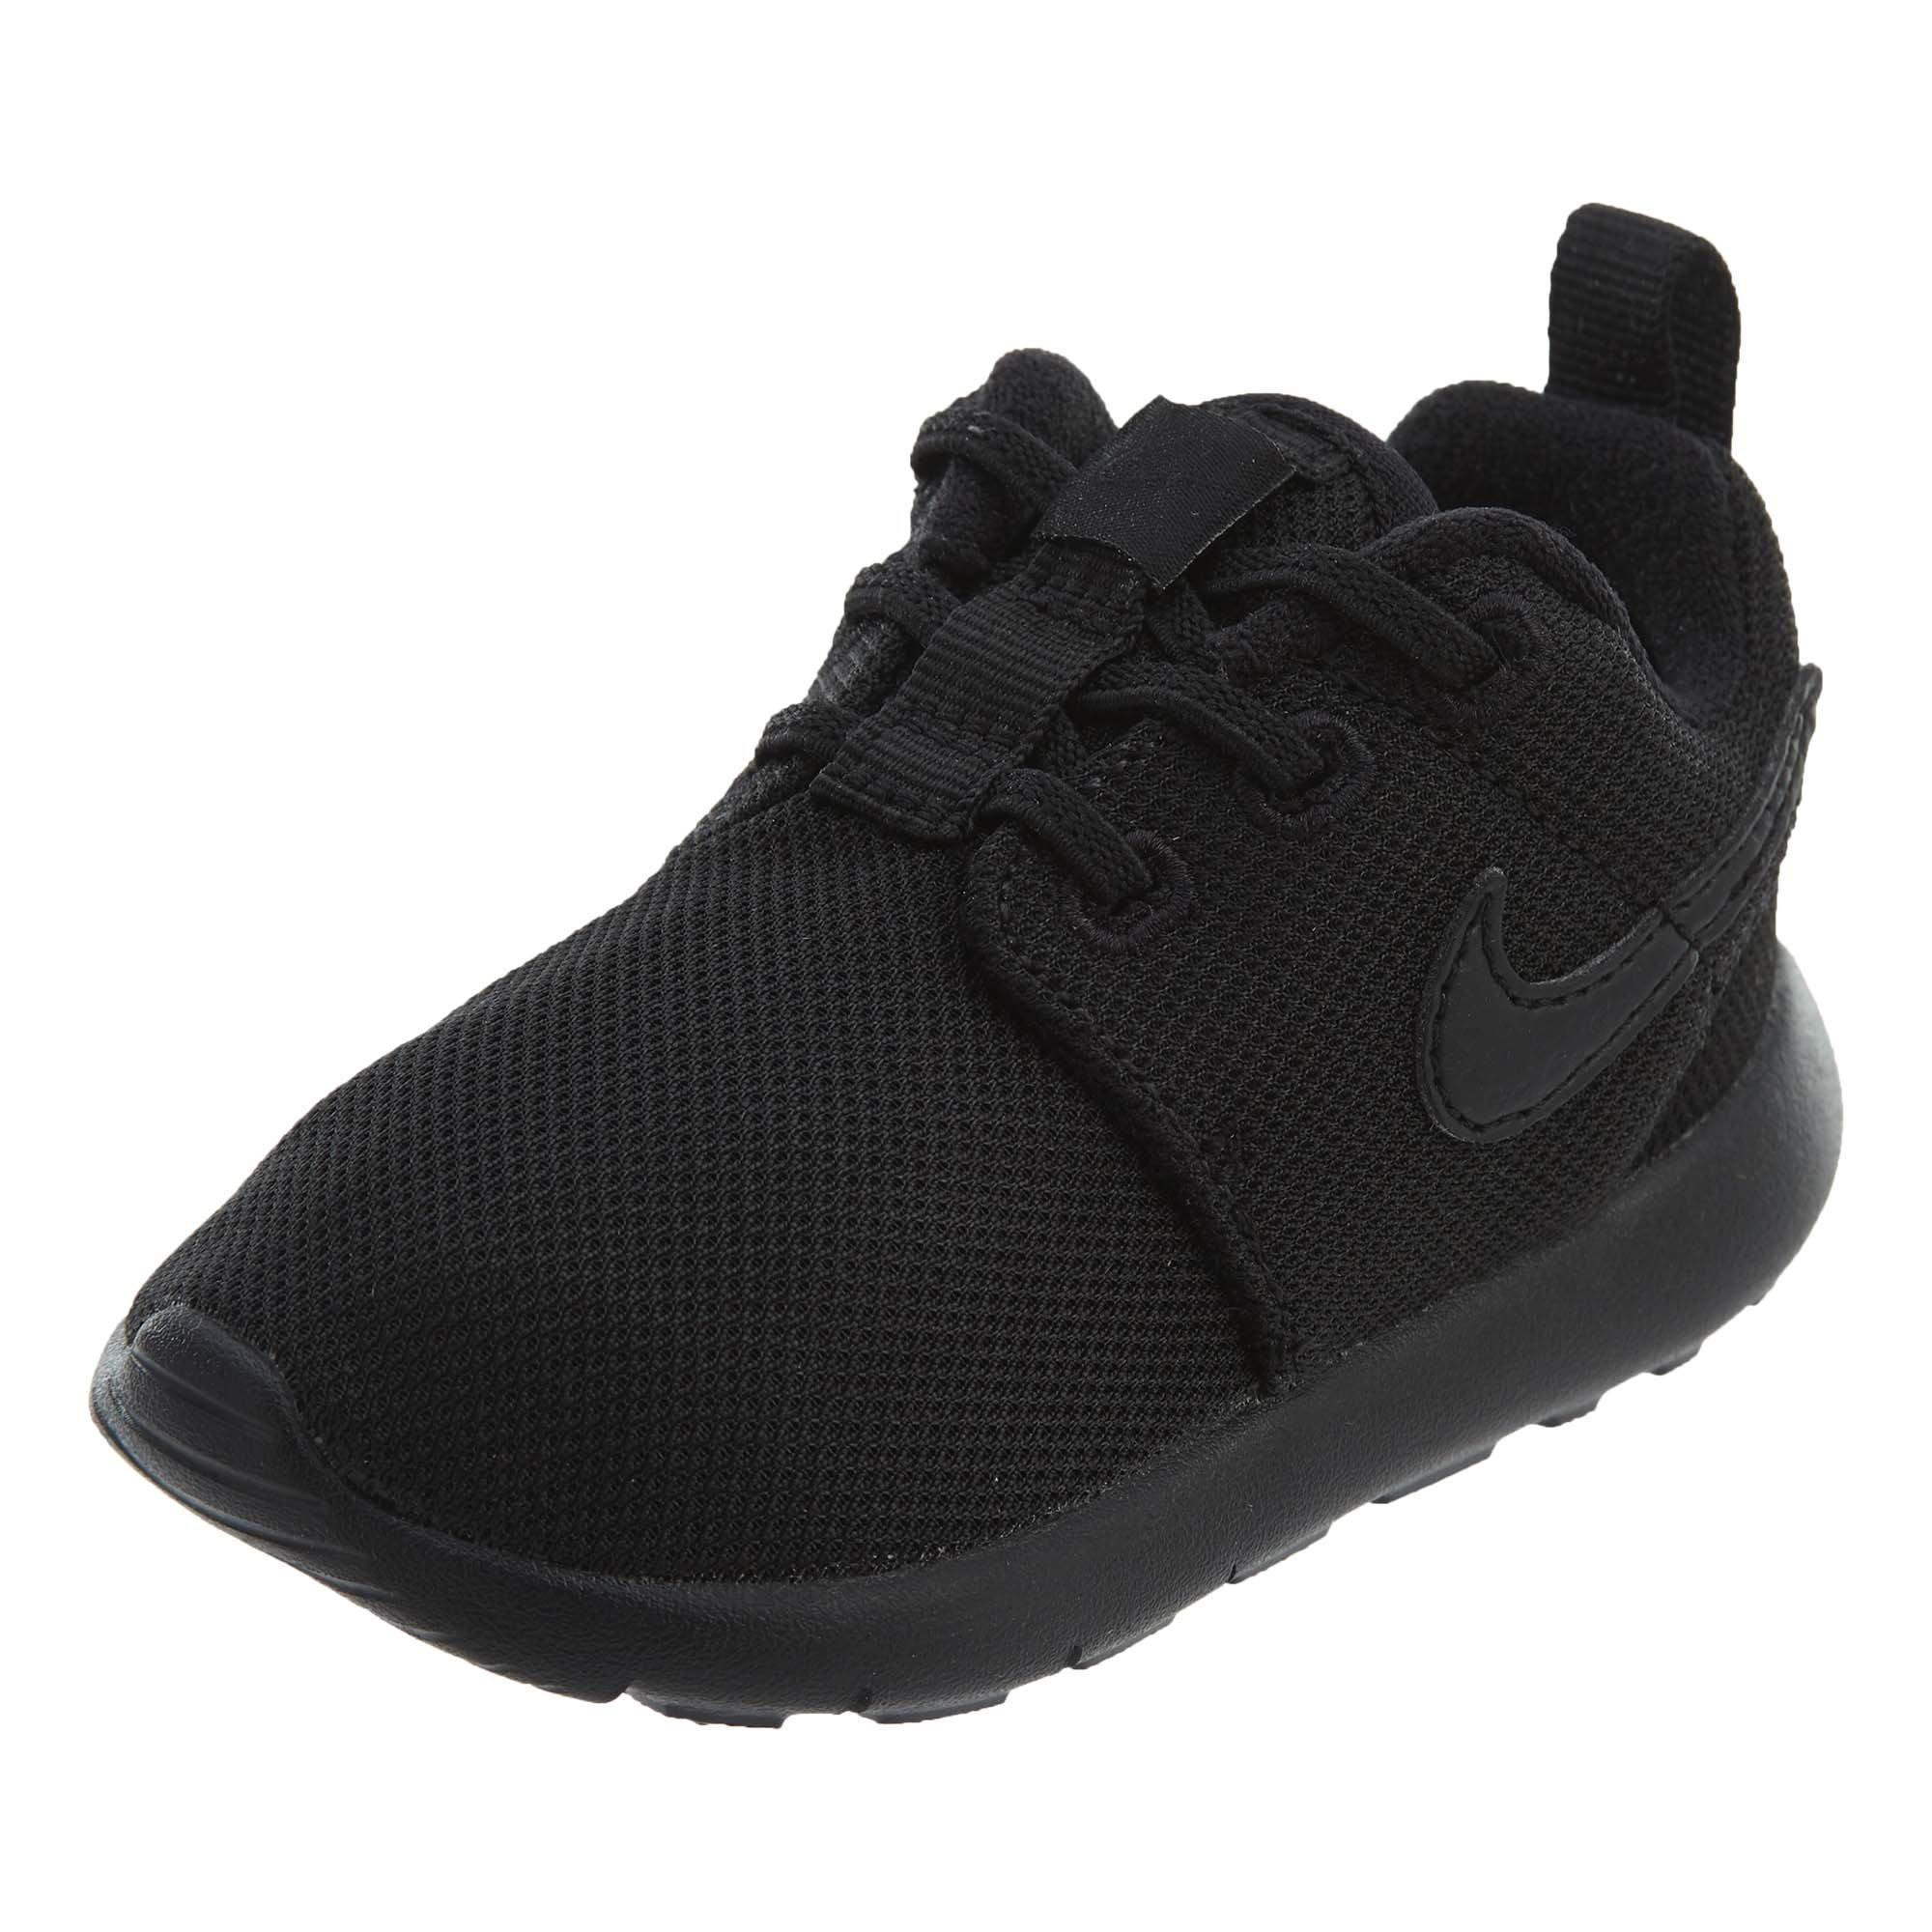 Nike Toddlers' Roshe One (TDV) Black Fabric Running Shoe 7 by Nike (Image #1)